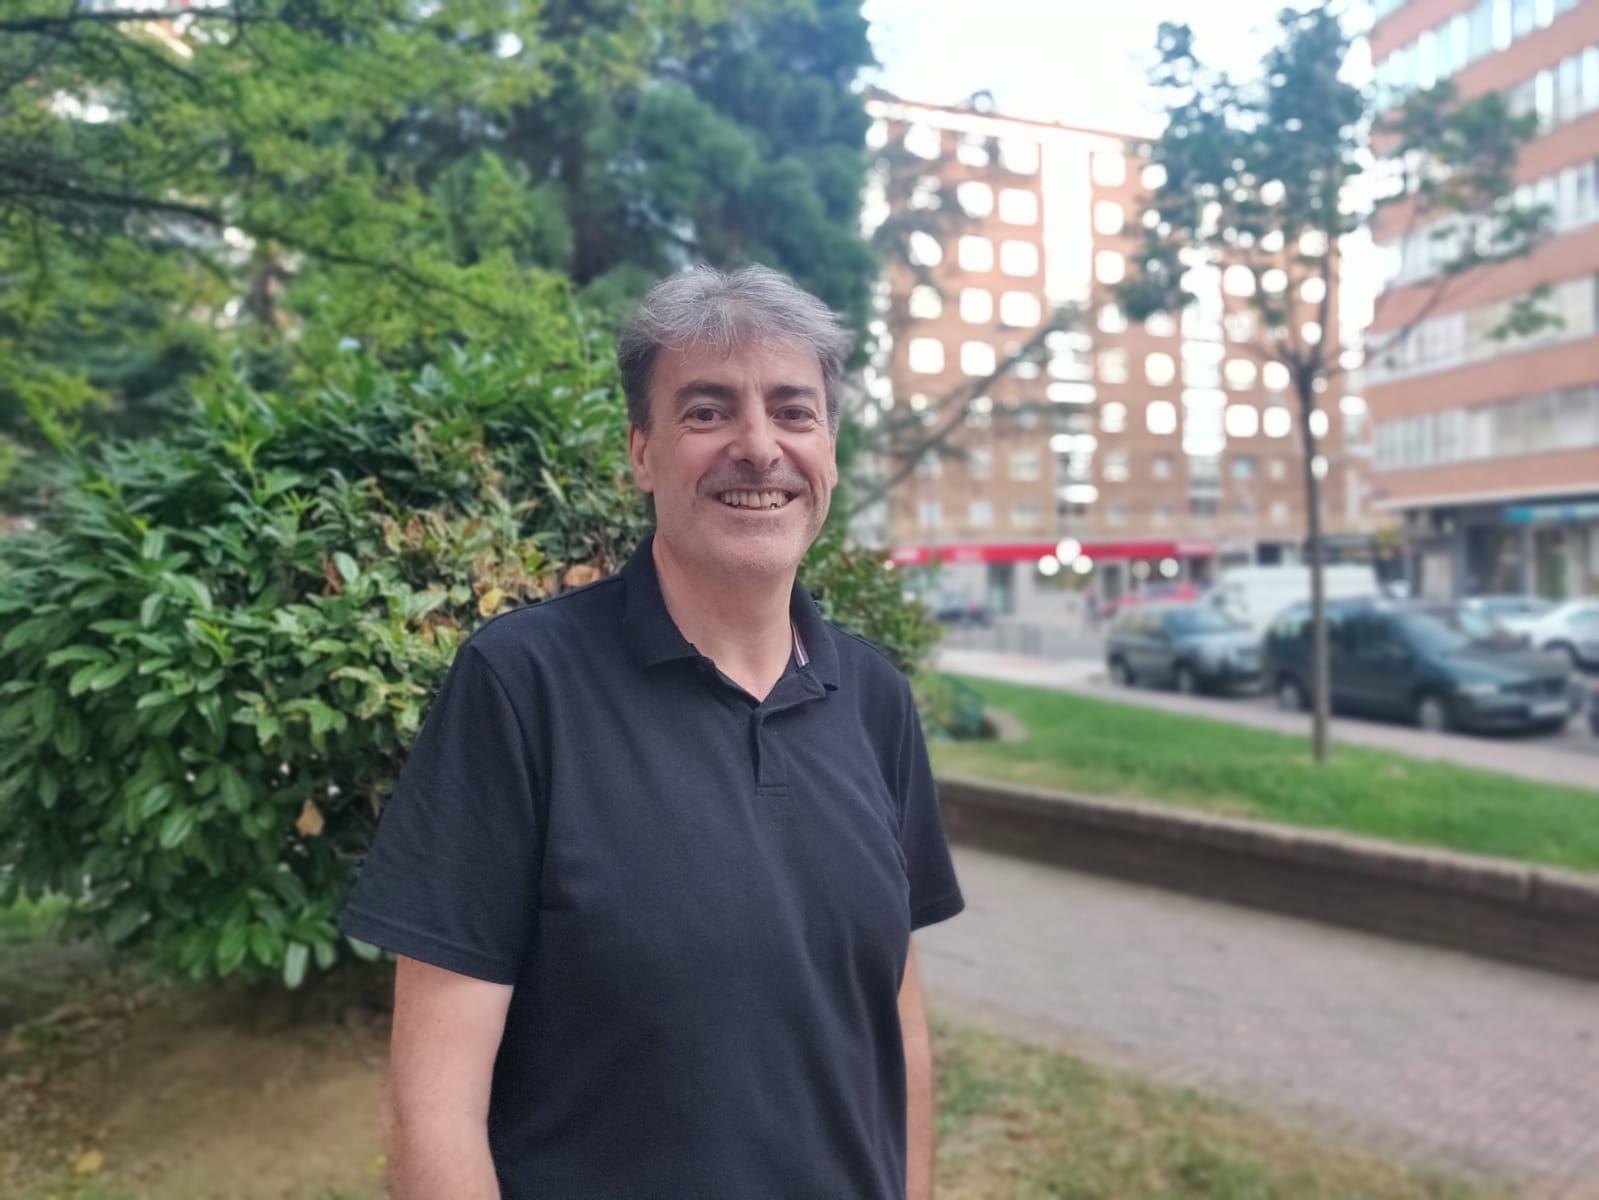 JOSE LUIS VILLALAIN 4